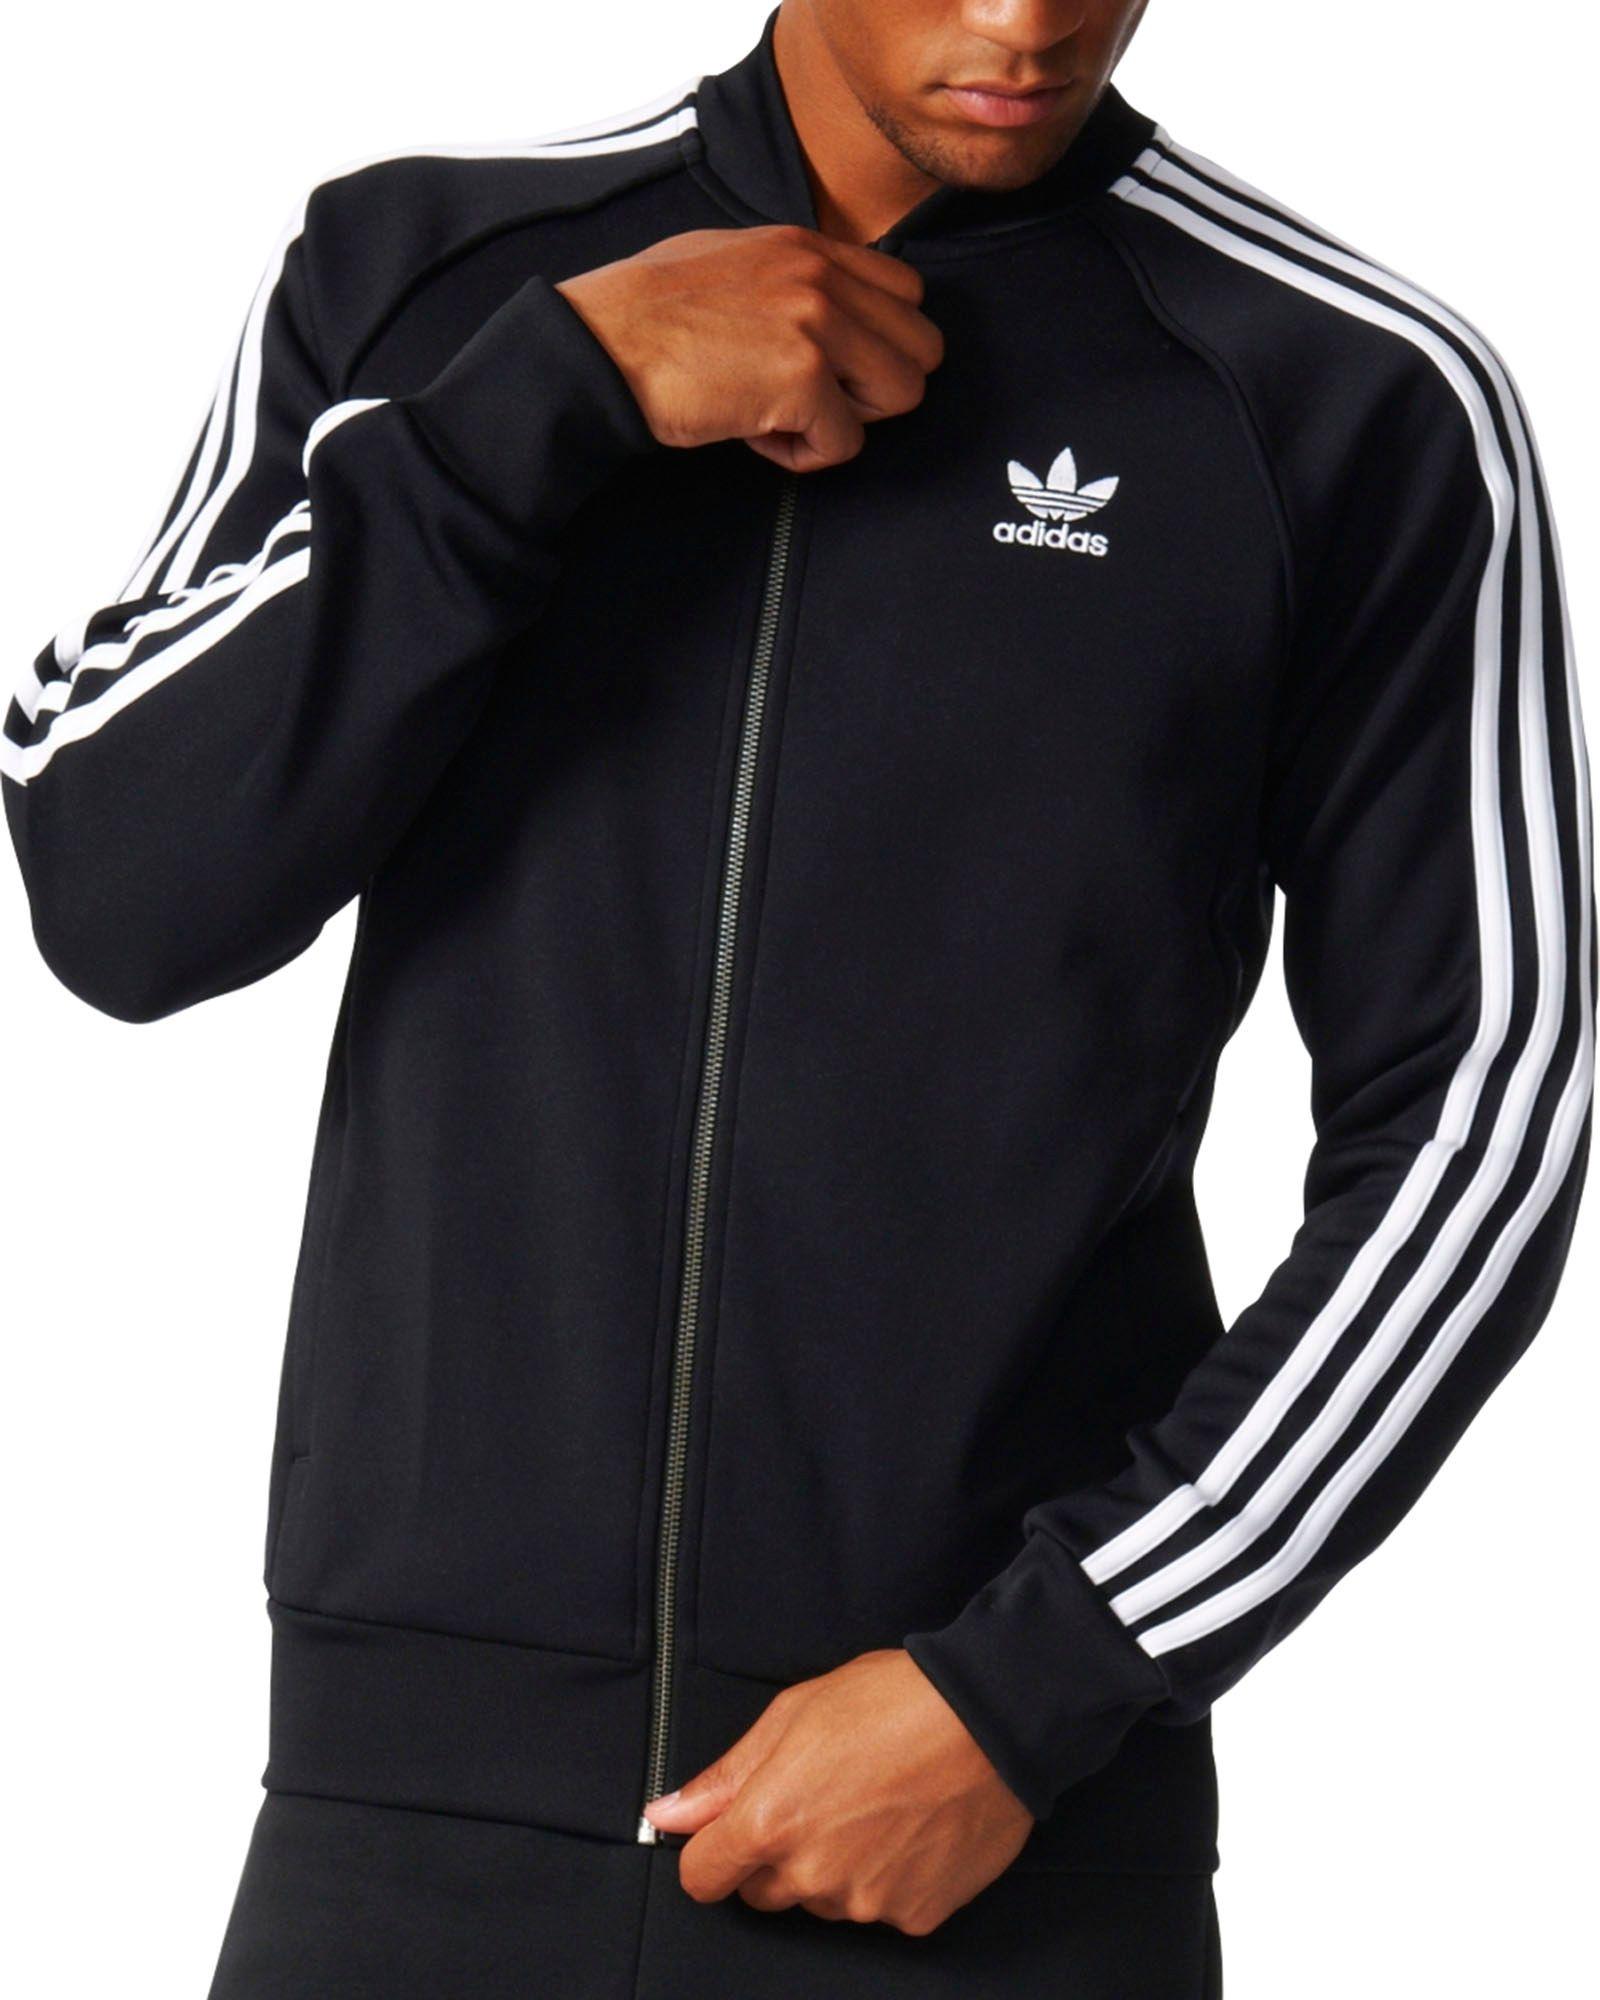 Adidas Originals Superstar Track chaqueta de los hombres de Dick 's Sporting goods